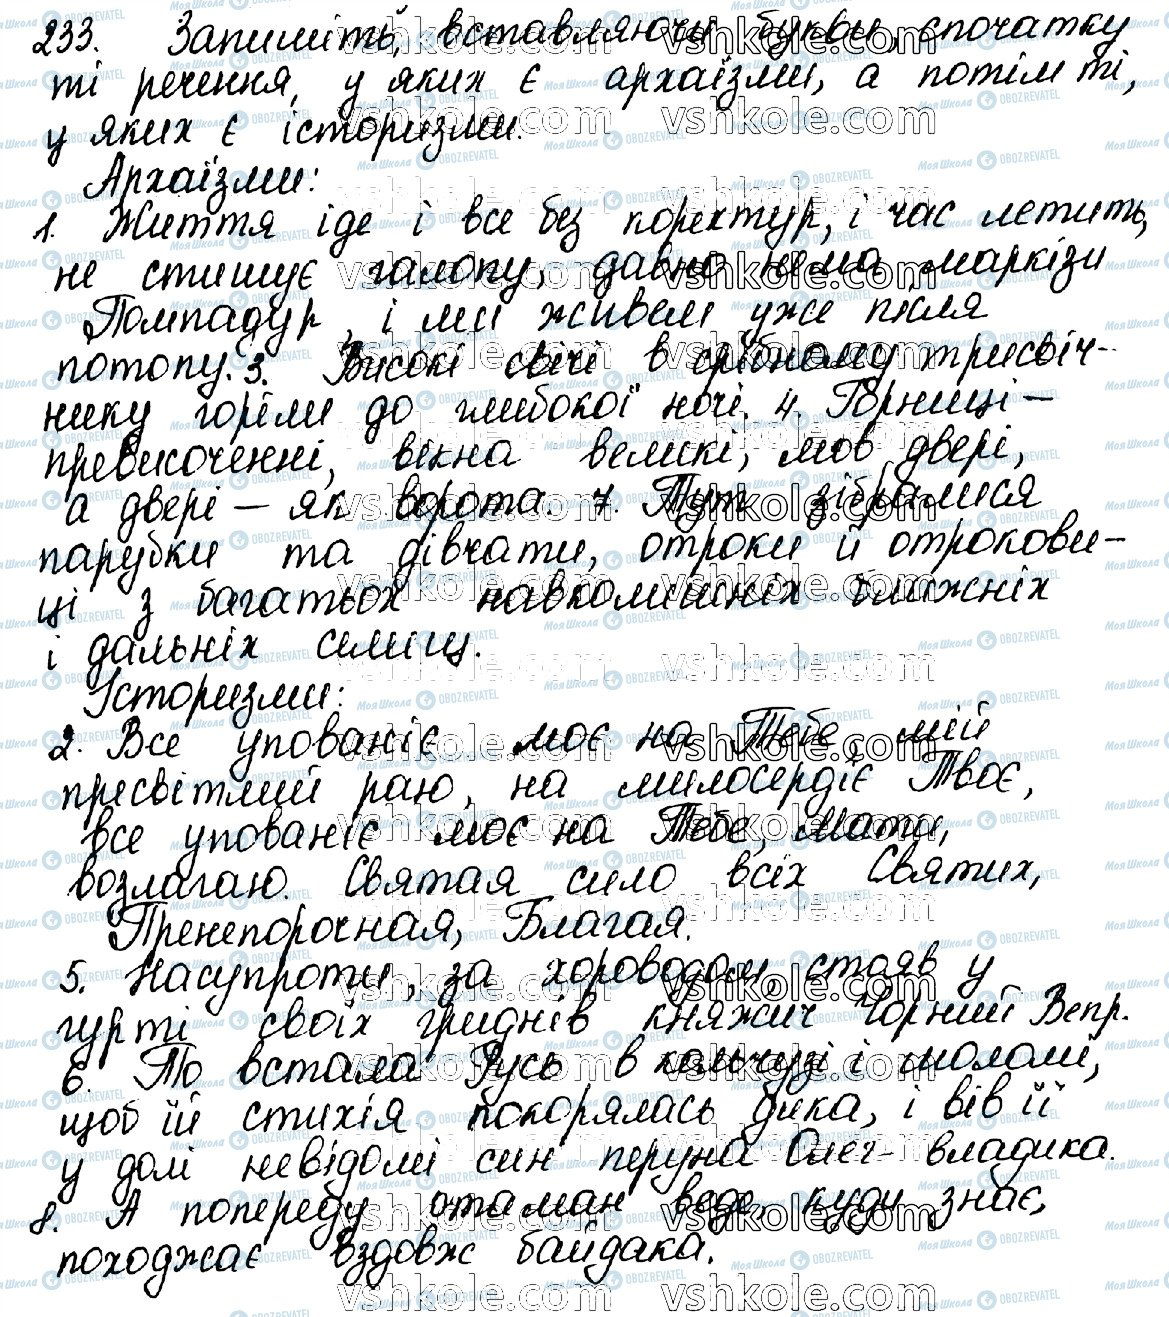 ГДЗ Укр мова 10 класс страница 233